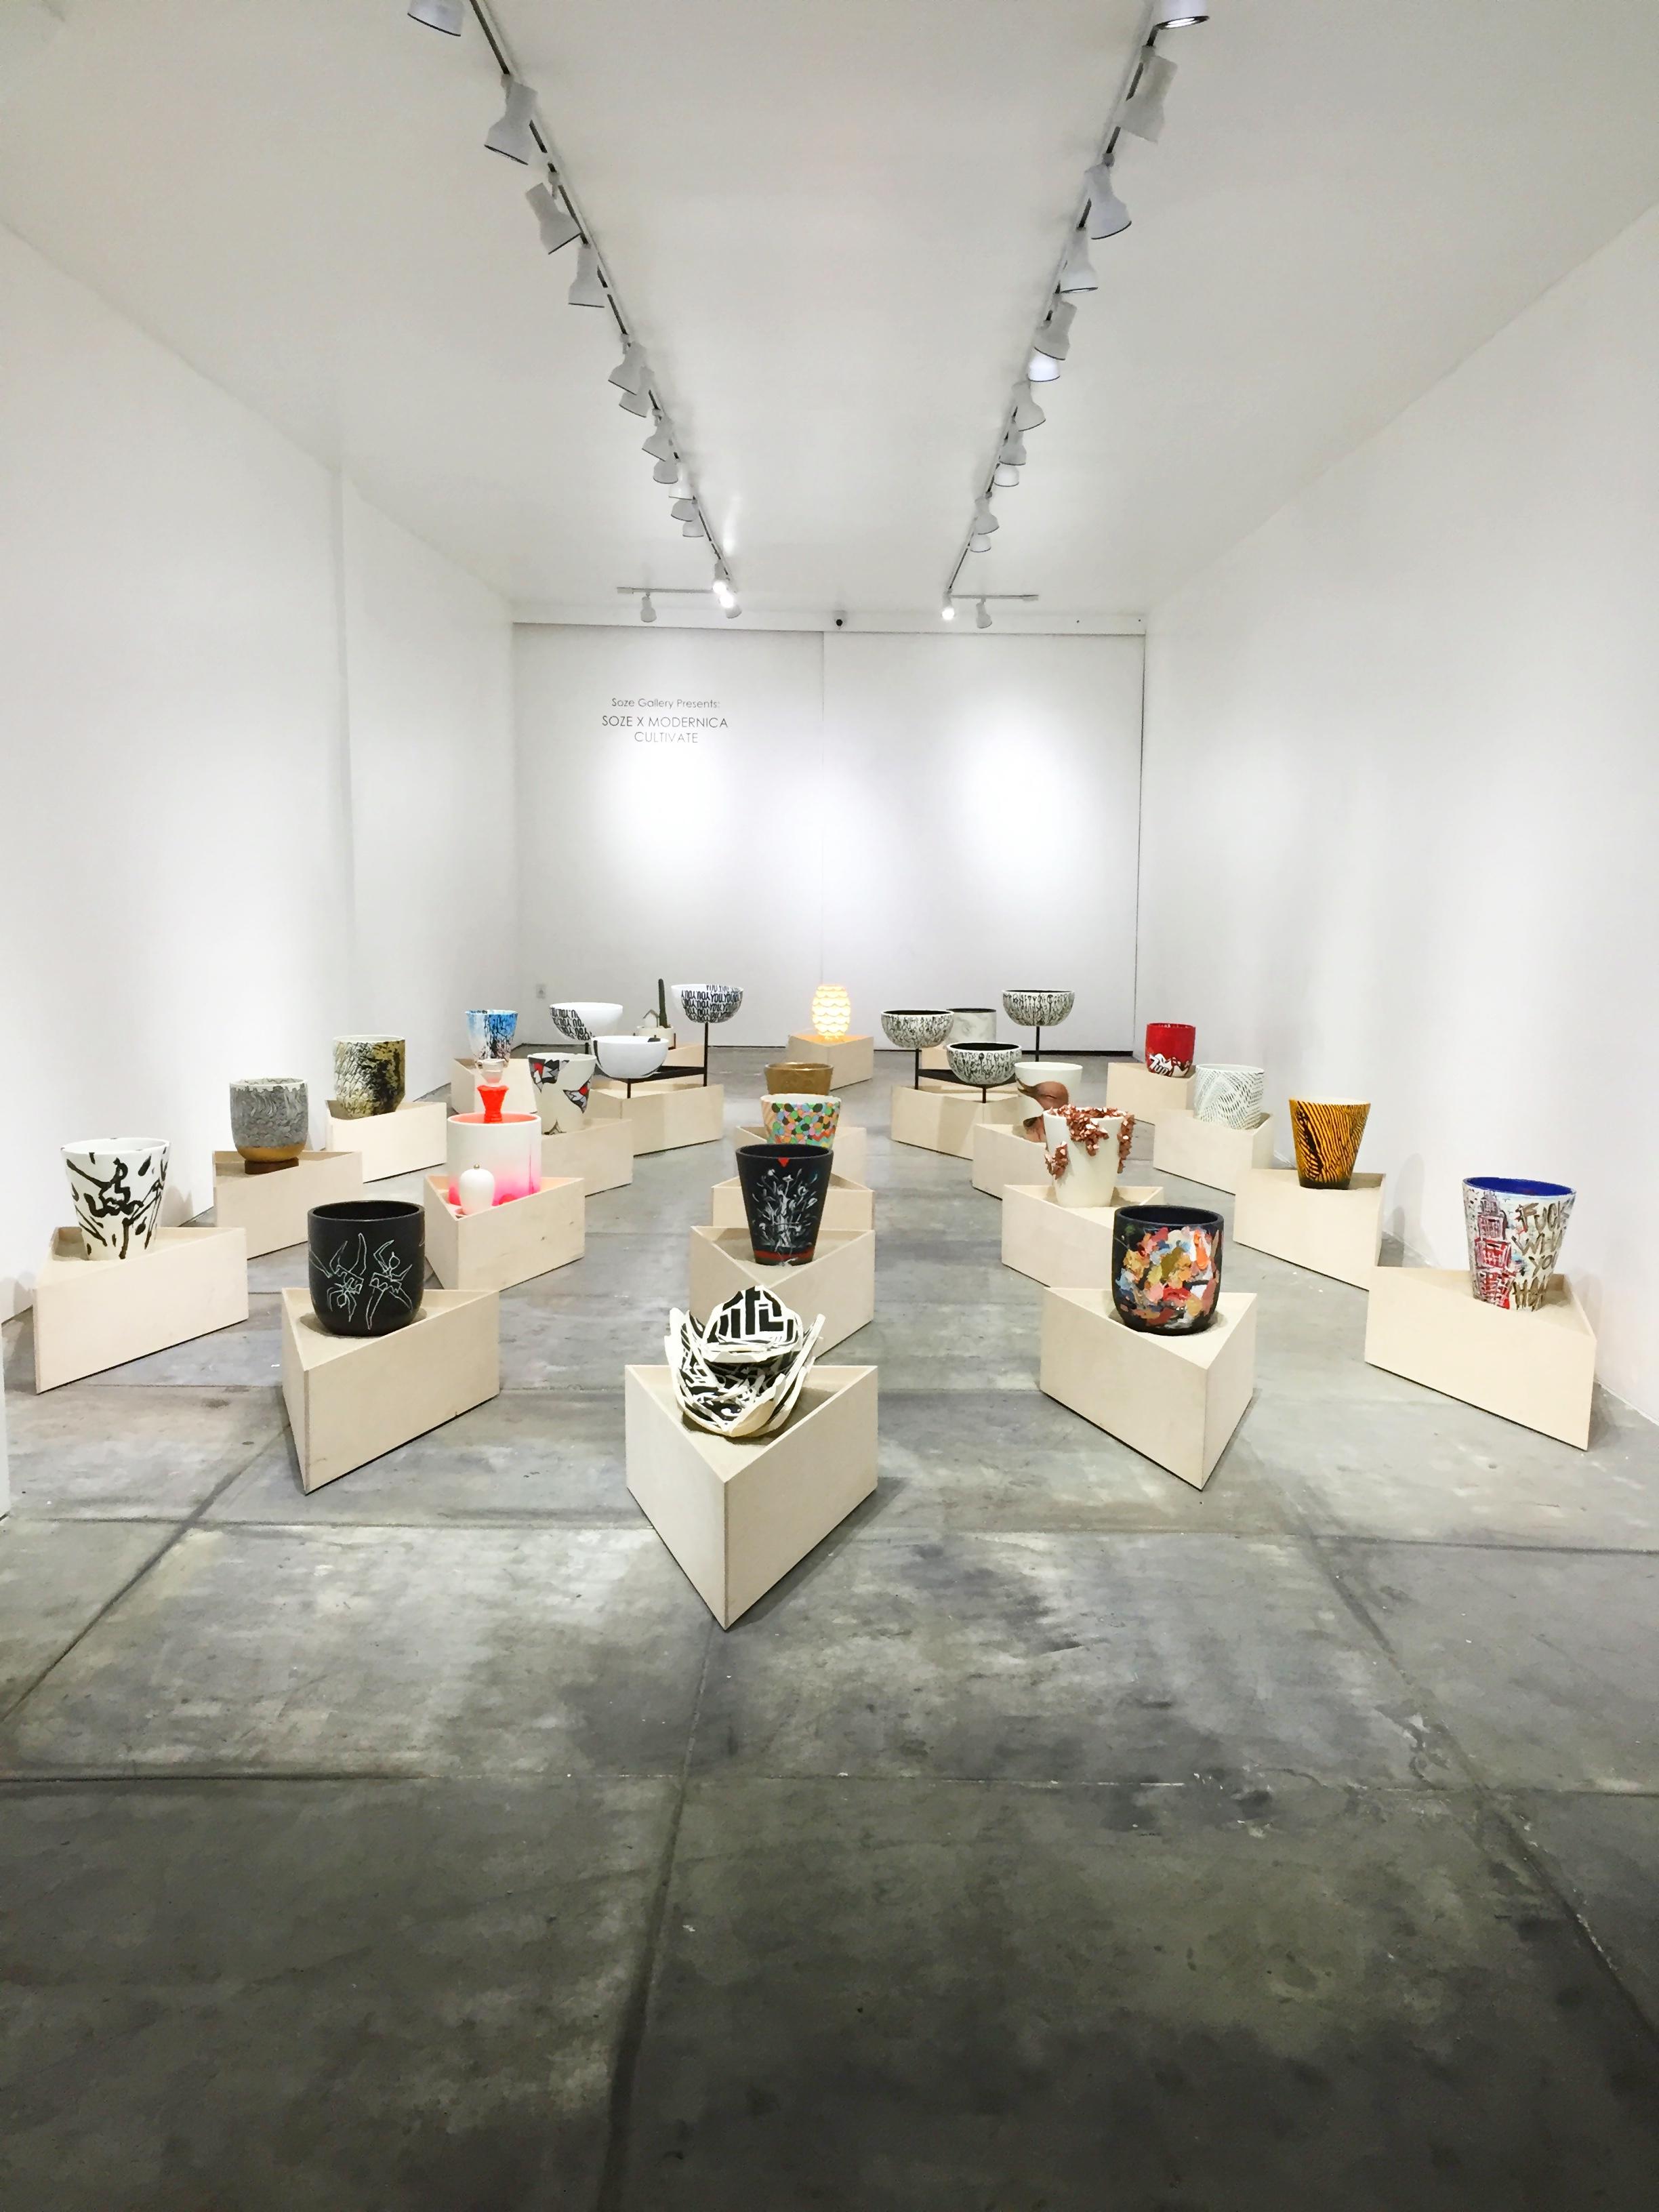 Modernica x Soze Gallery